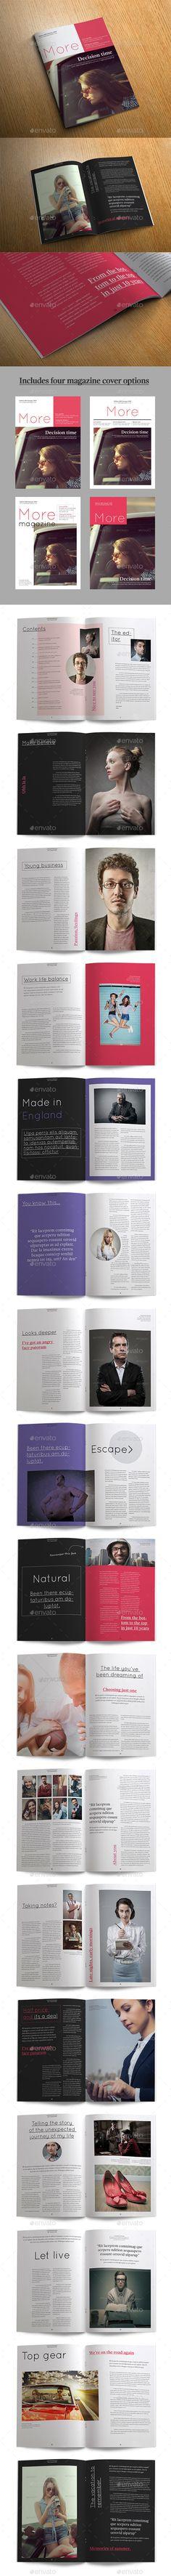 More Magazine Magazine TemplatePrint 40 Pages